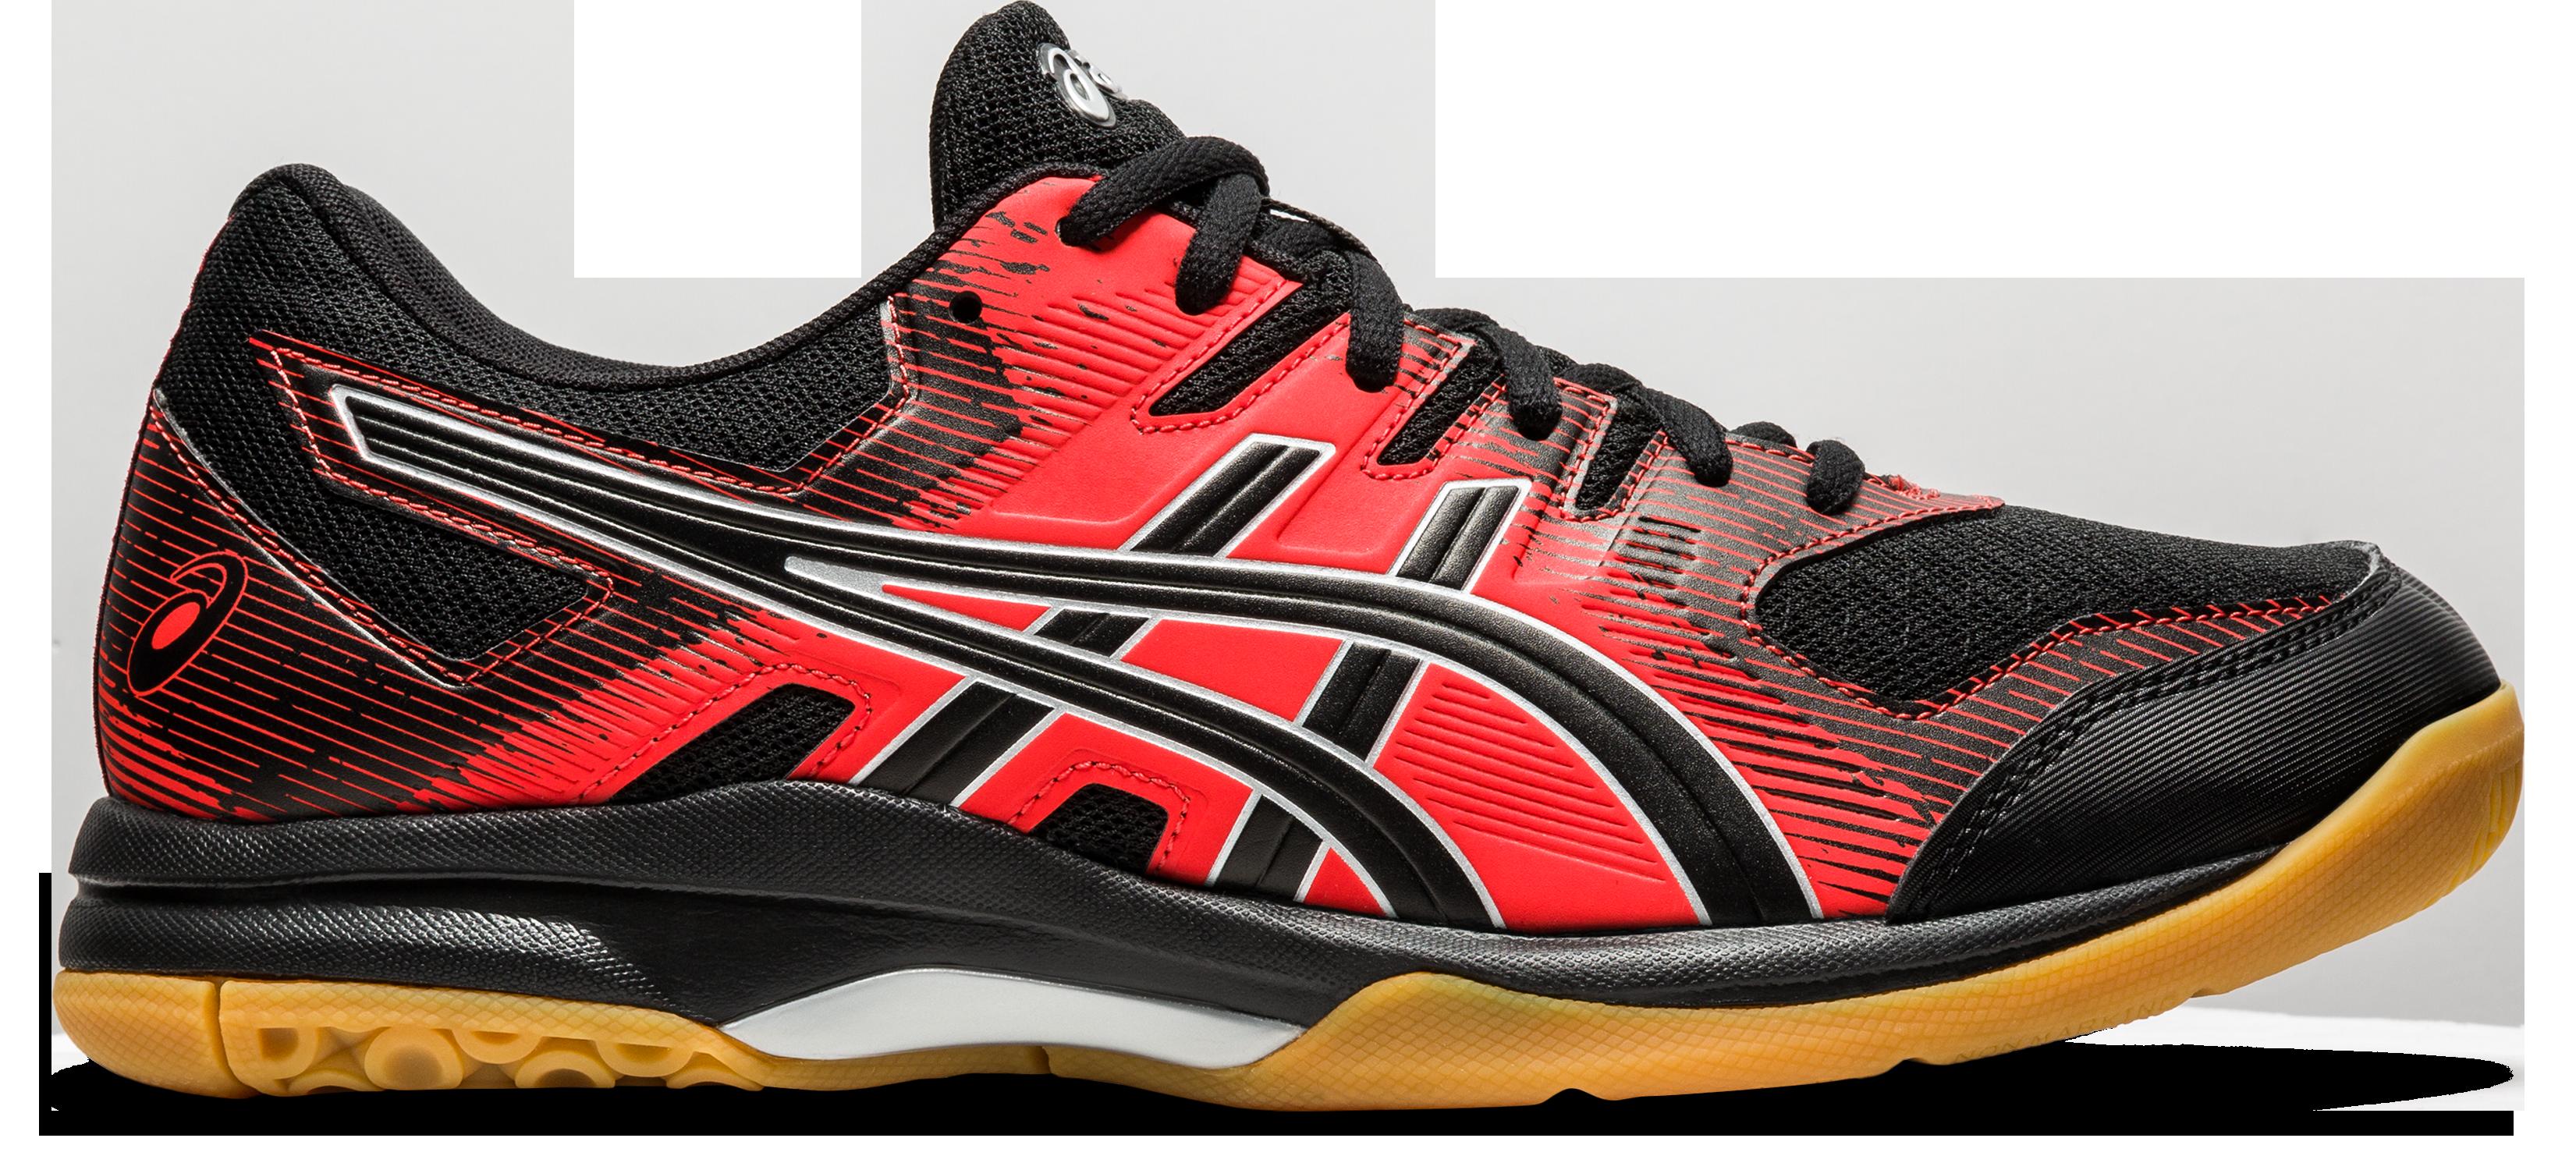 Asics Gel Rocket 9 Mens Squash Shoes NZ.